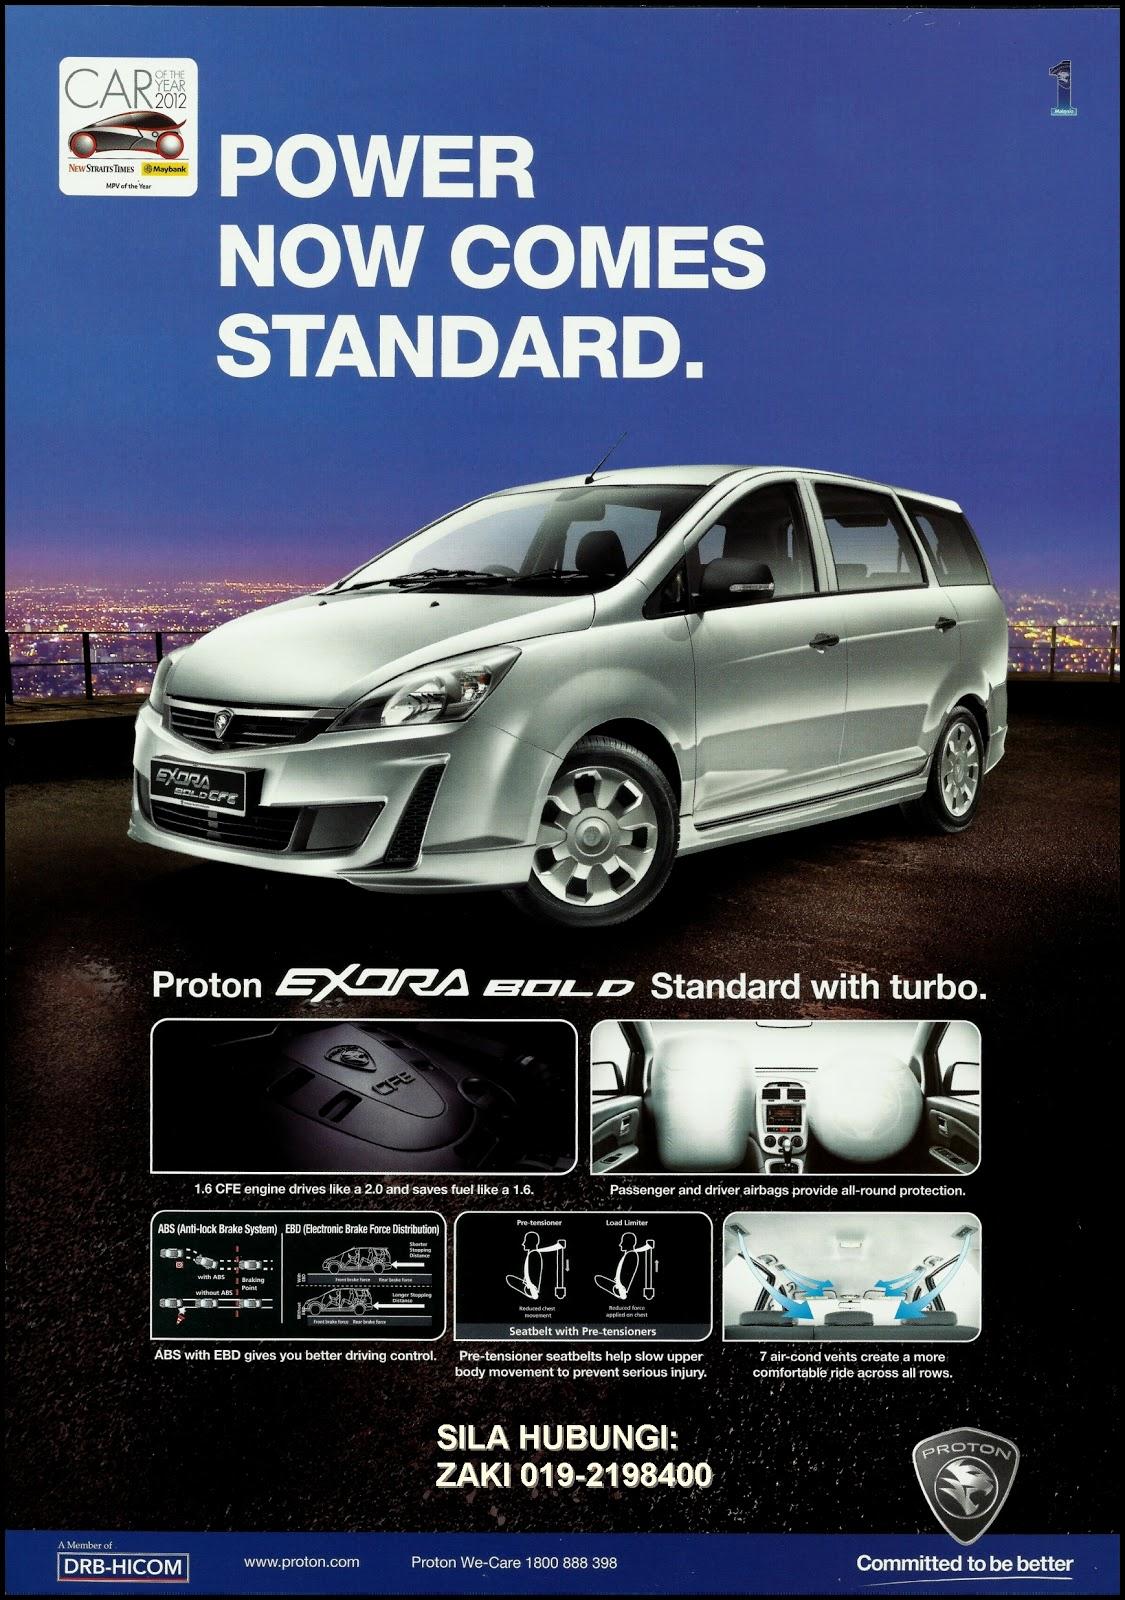 Proton Exora Bold 1.6 CFE Turbo (Auto) Standard